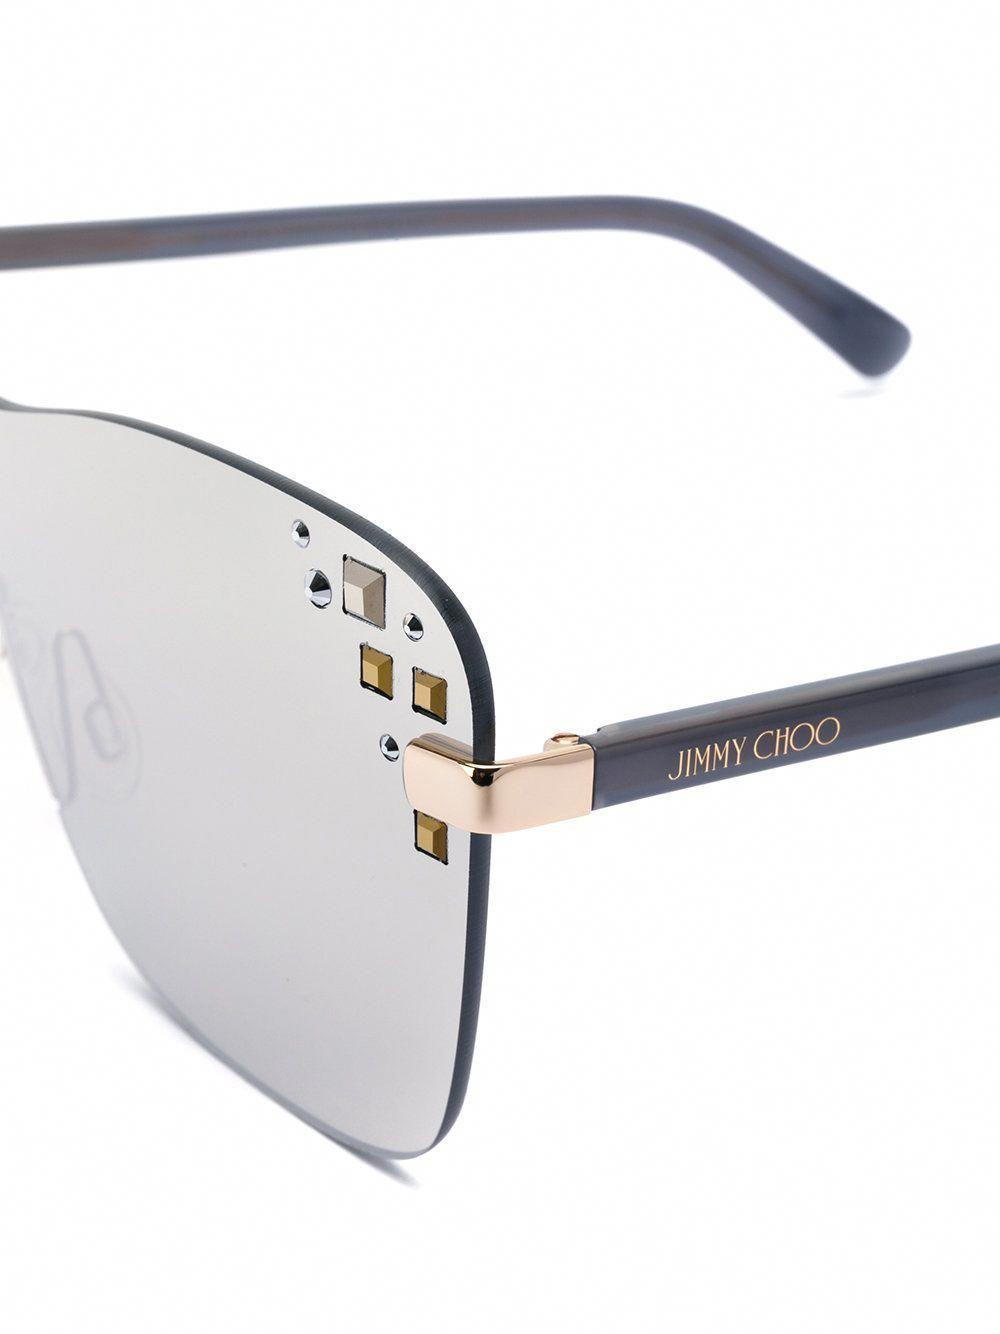 de Choo gafas de jimmychoo gafas Máscara sol Jimmy 7q4Z4F